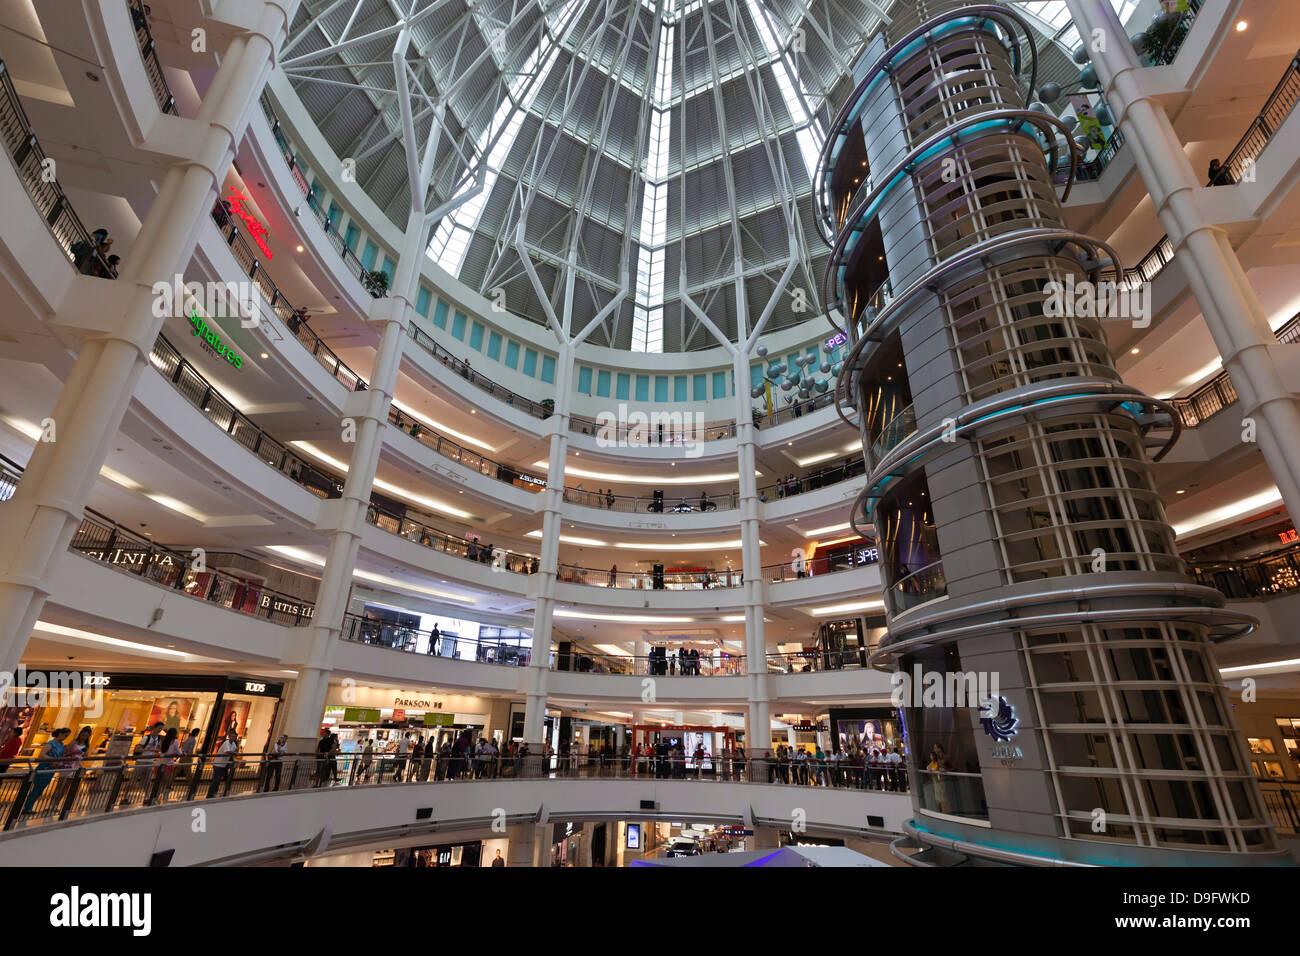 Suria KLCC shopping mall next to the Petronas Towers, Kuala Lumpur, Malaysia, Southeast Asia - Stock Image